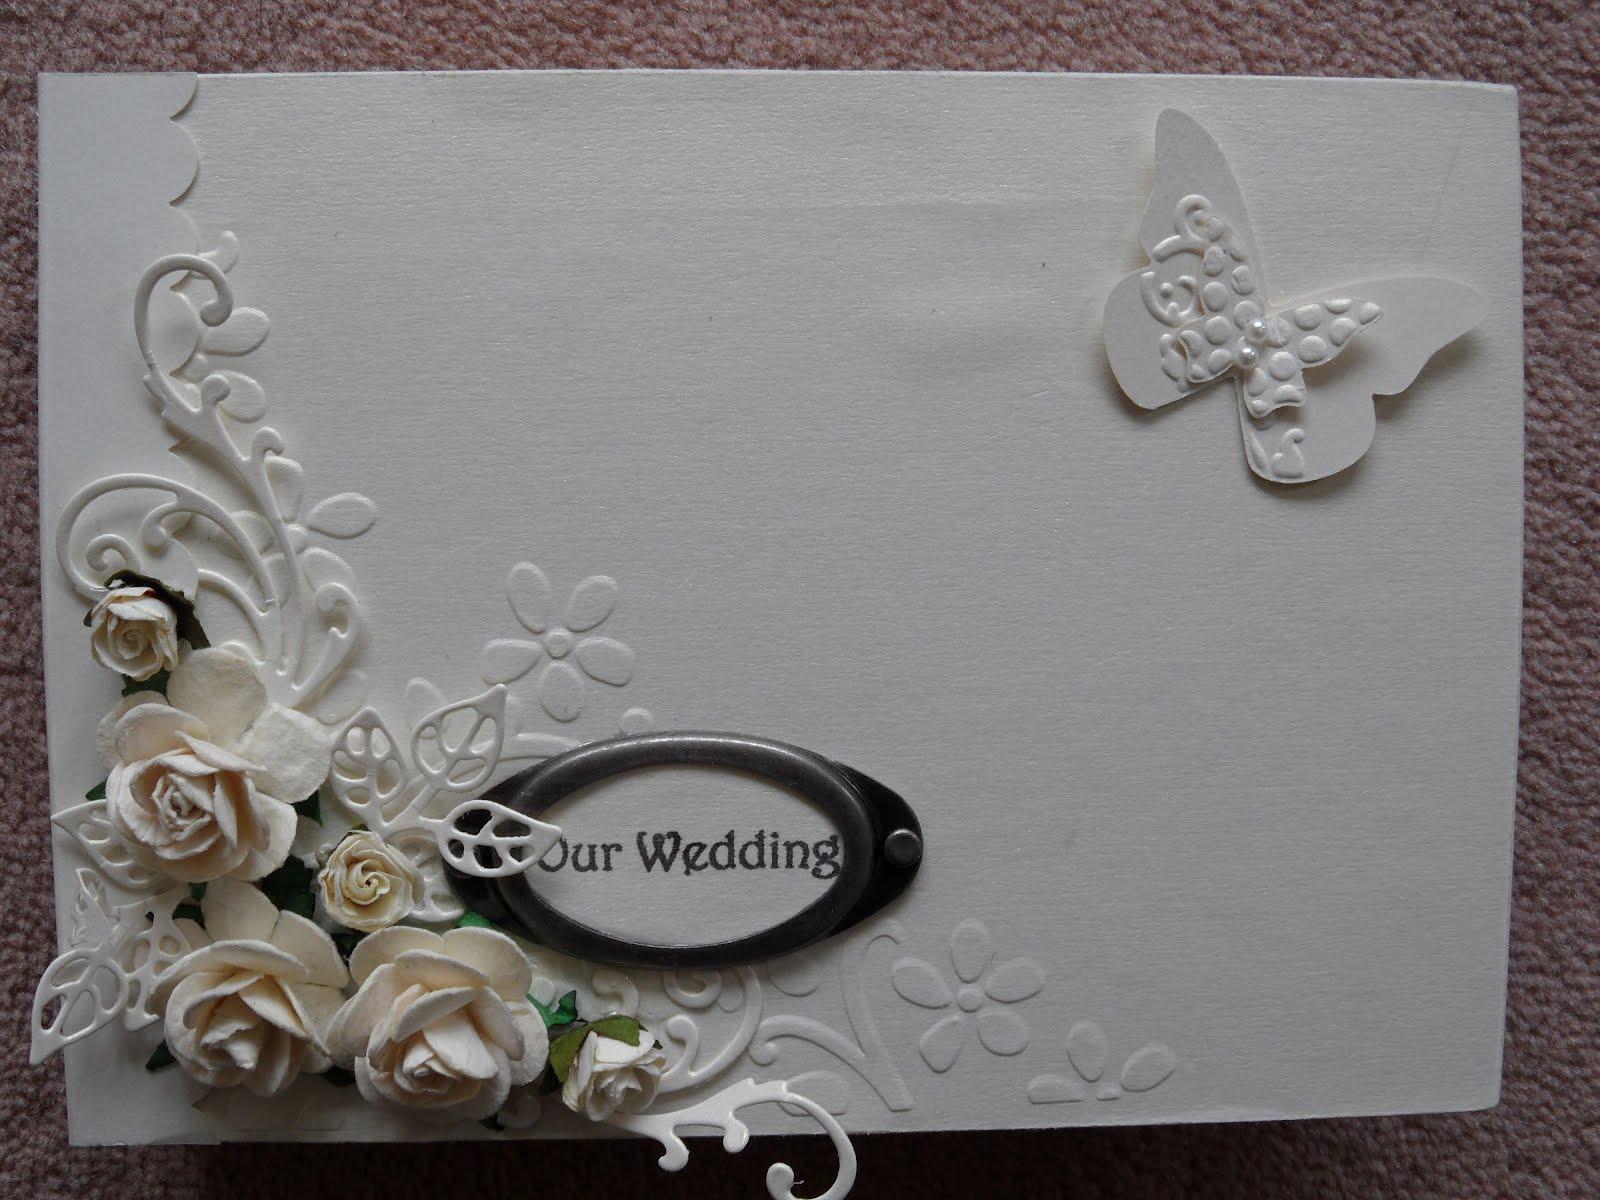 Craft Wedding Gifts: Linda's Craft Room: Wedding Gift Album